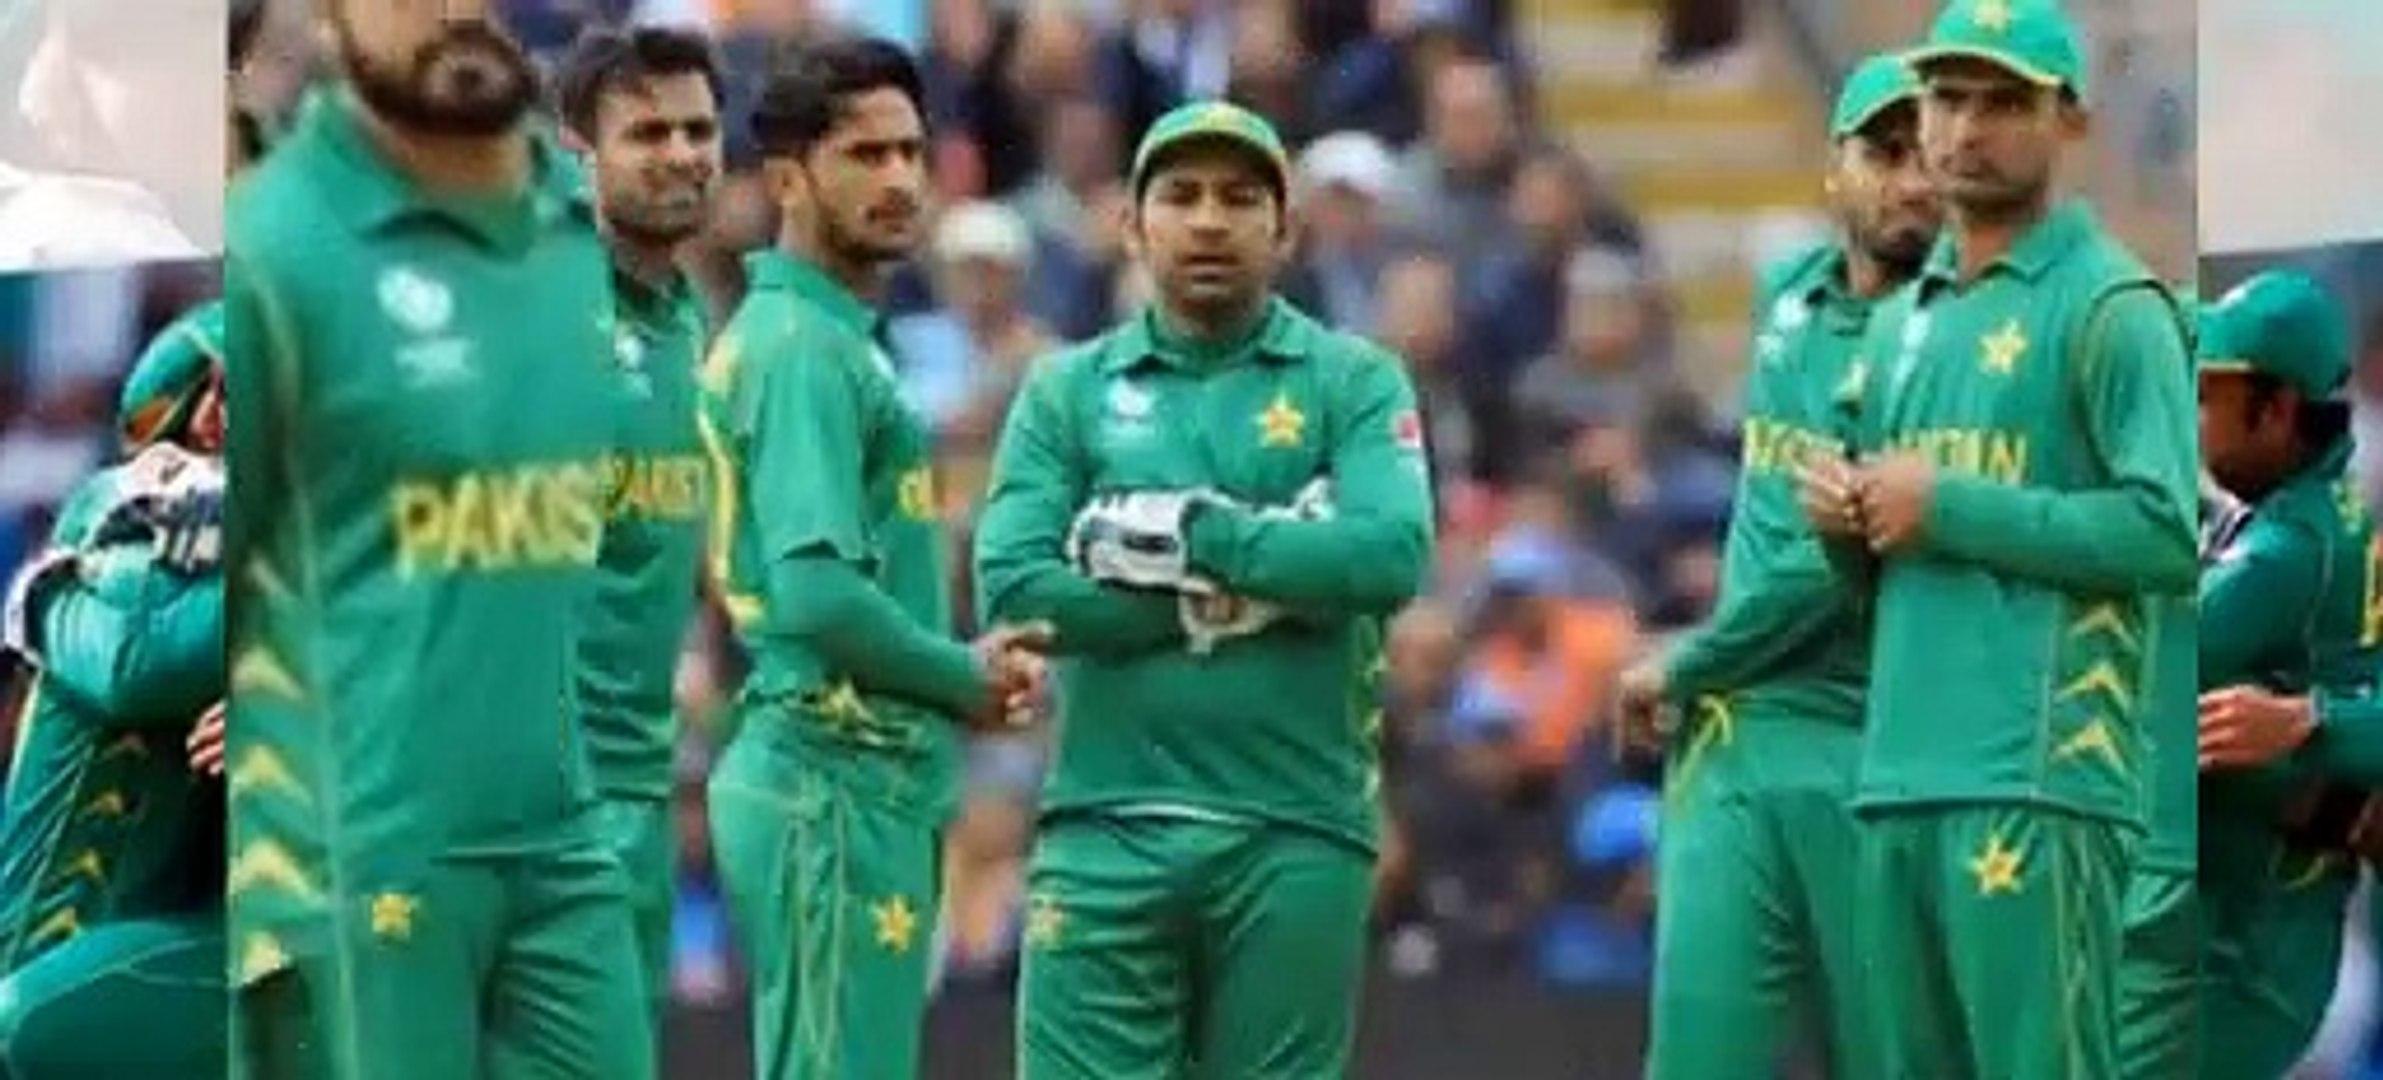 Bangladesh vs Pakistan 2019 Highlights - BangladeshvsPakistan 2019 Highlights   Bangladesh vs Pakist